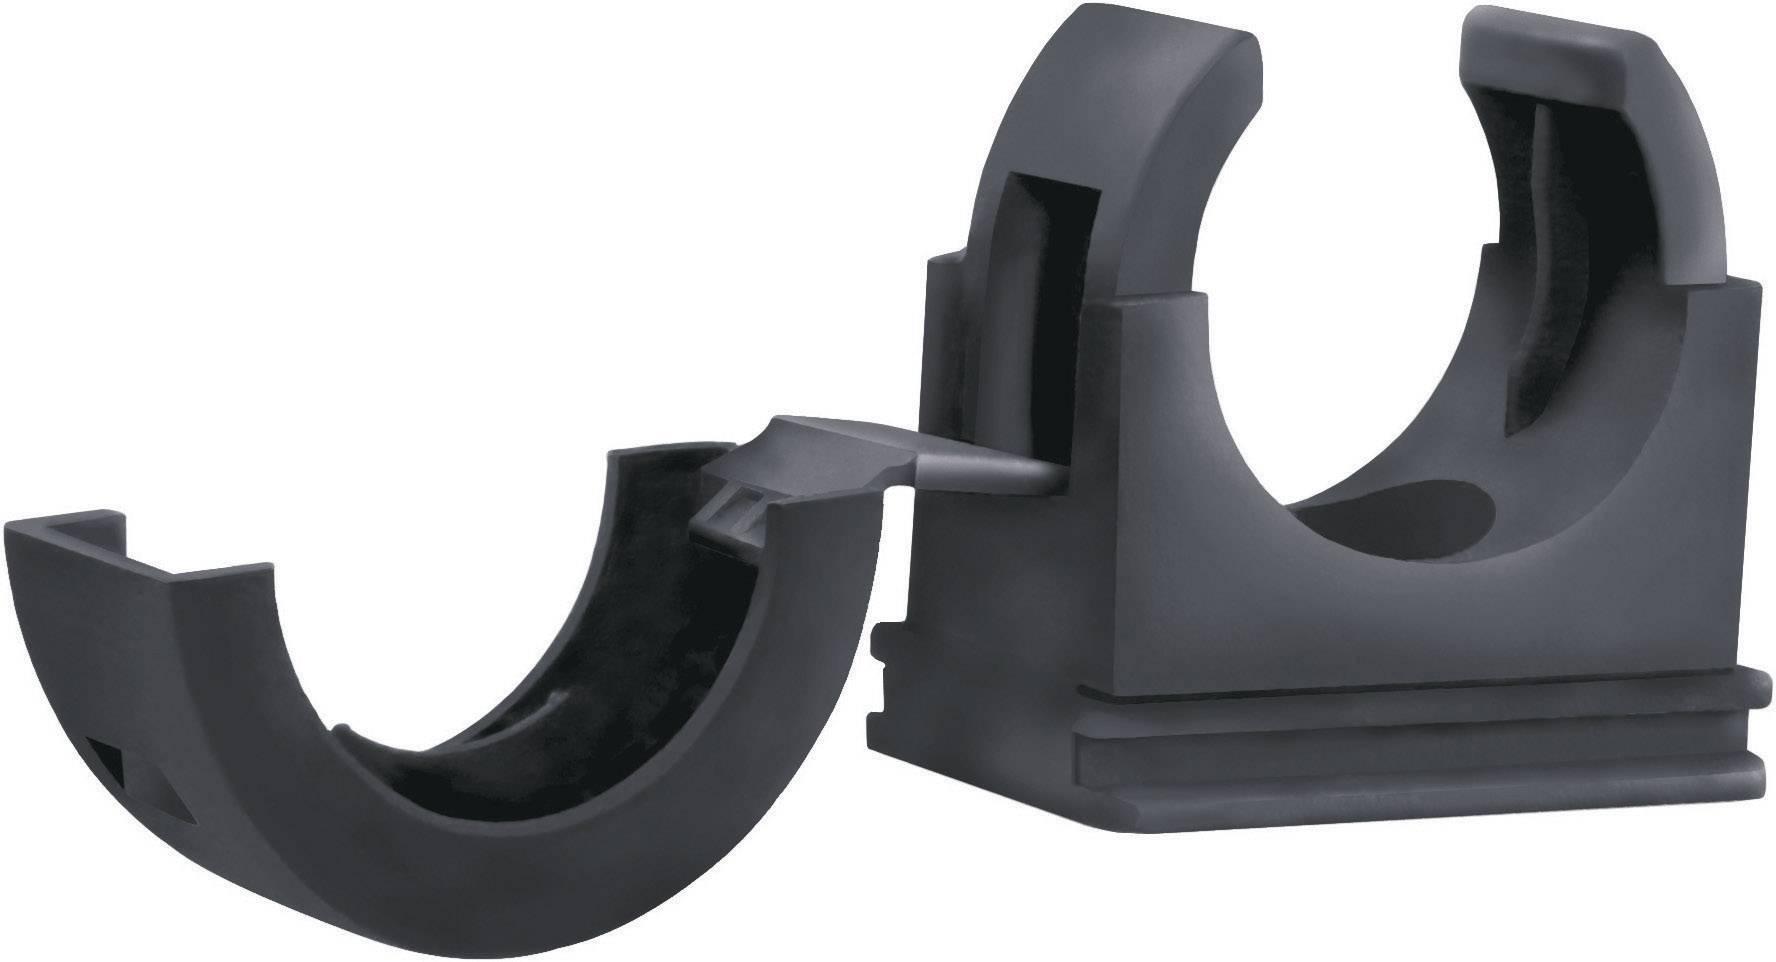 LappKabel SILVYN® FCL 18 55506985, 14.20 mm, čierna, 1 ks